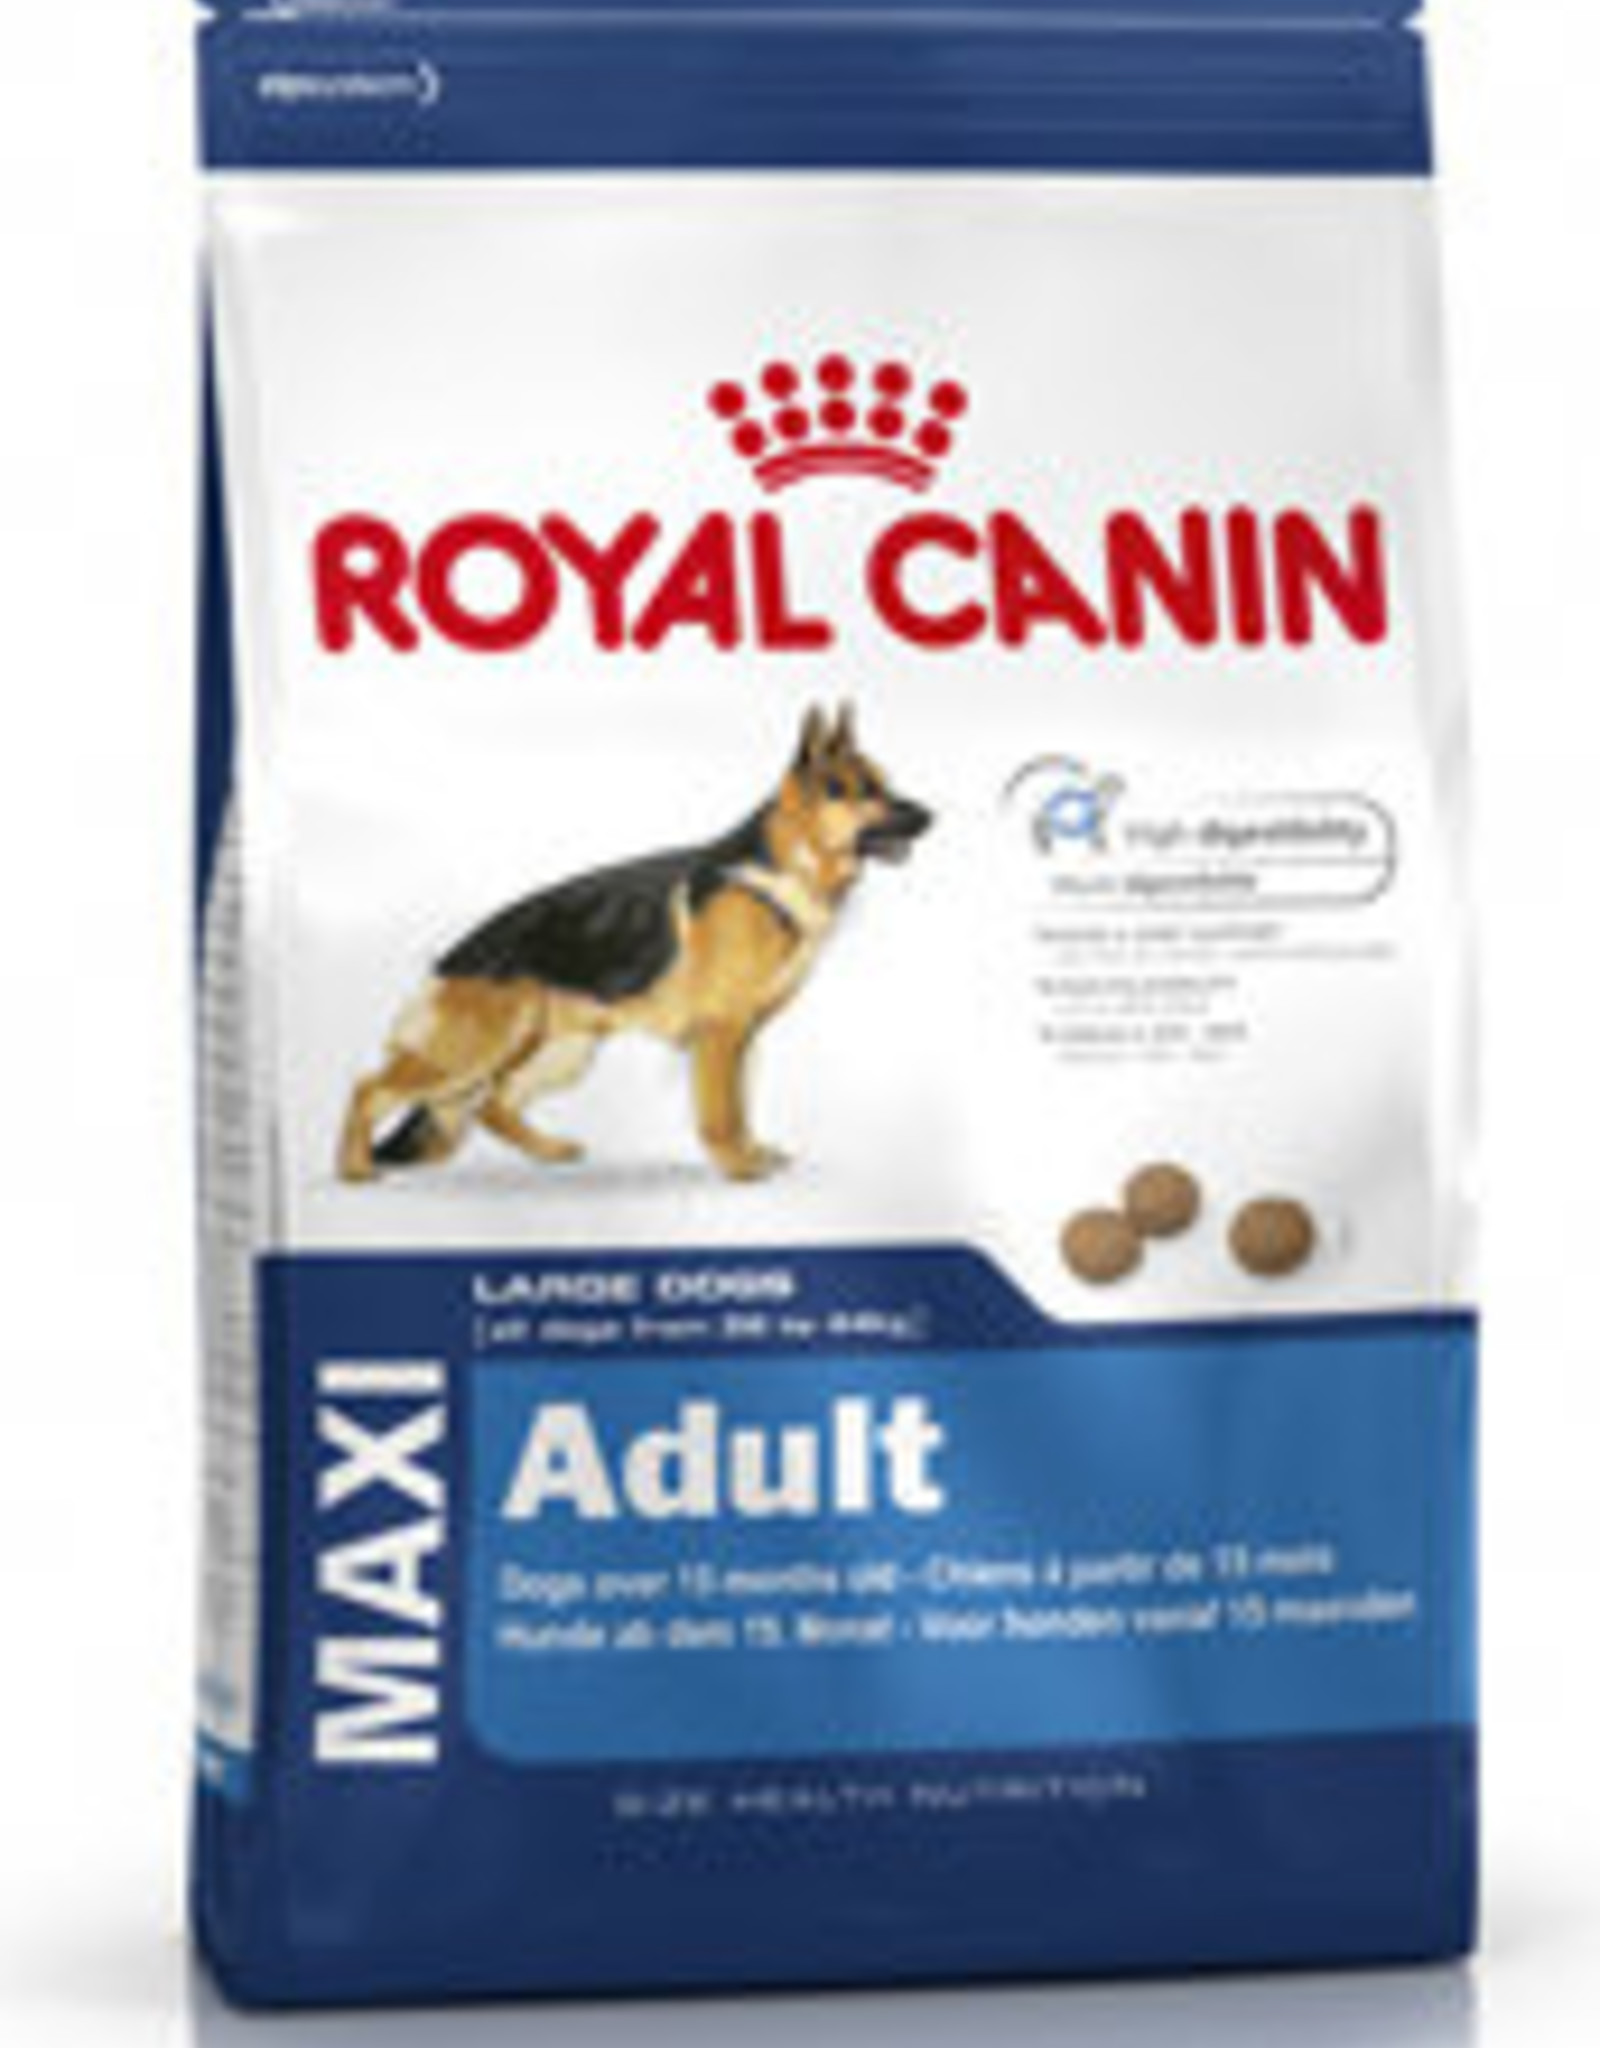 Royal Canin Royal Canin Shn Maxi Adult Chien 4kg